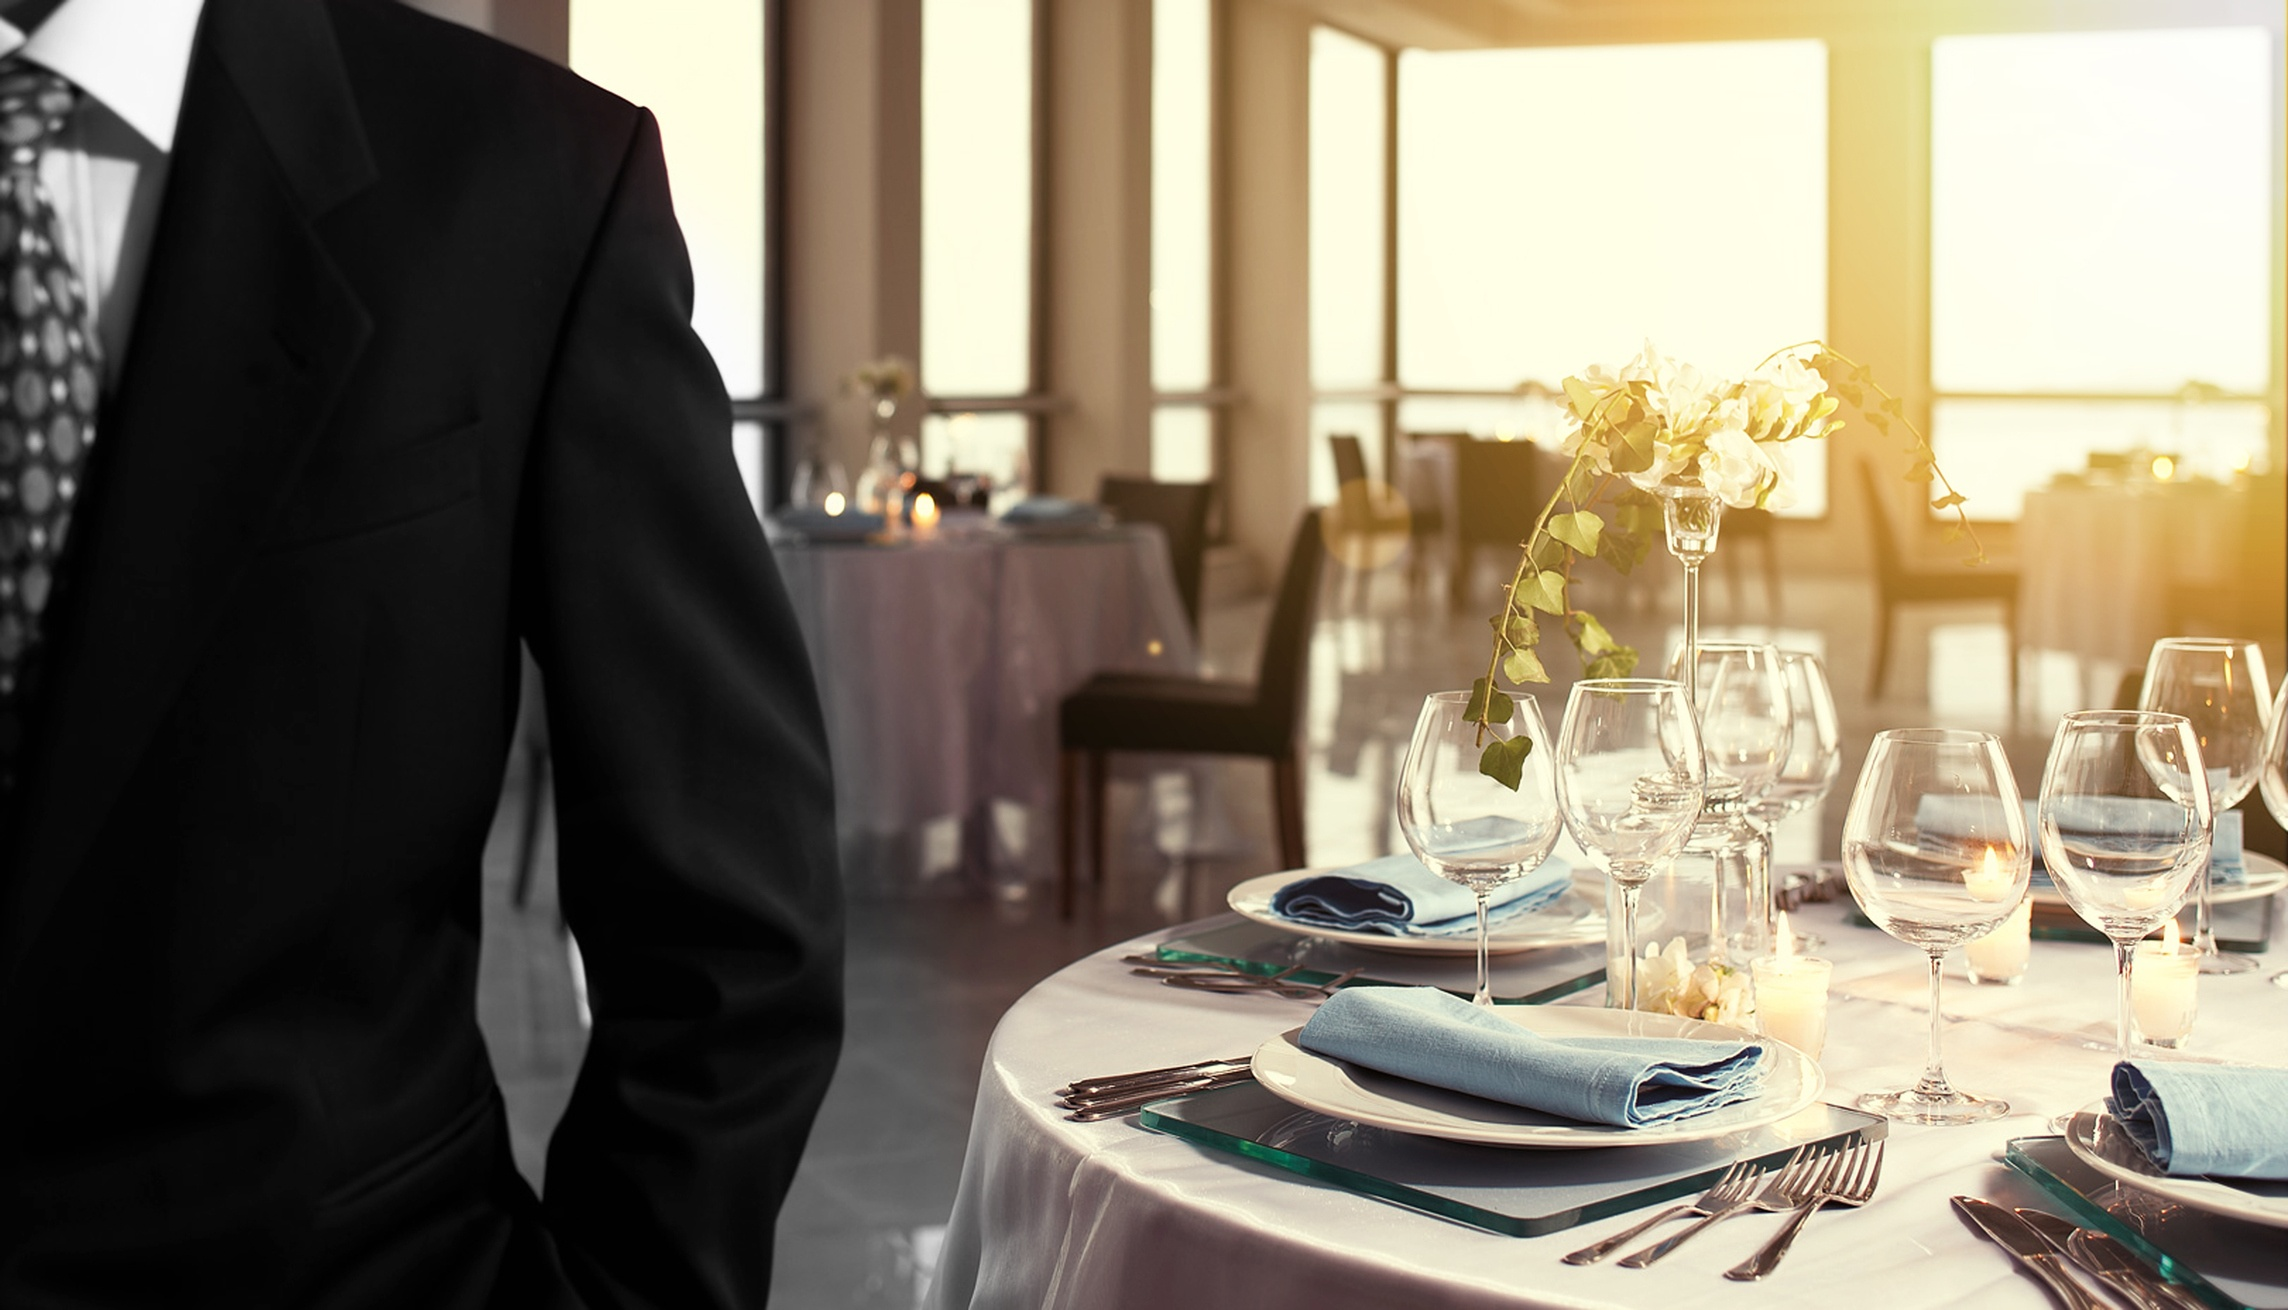 wedding business table setting - ThinkstockPhotos-541823516